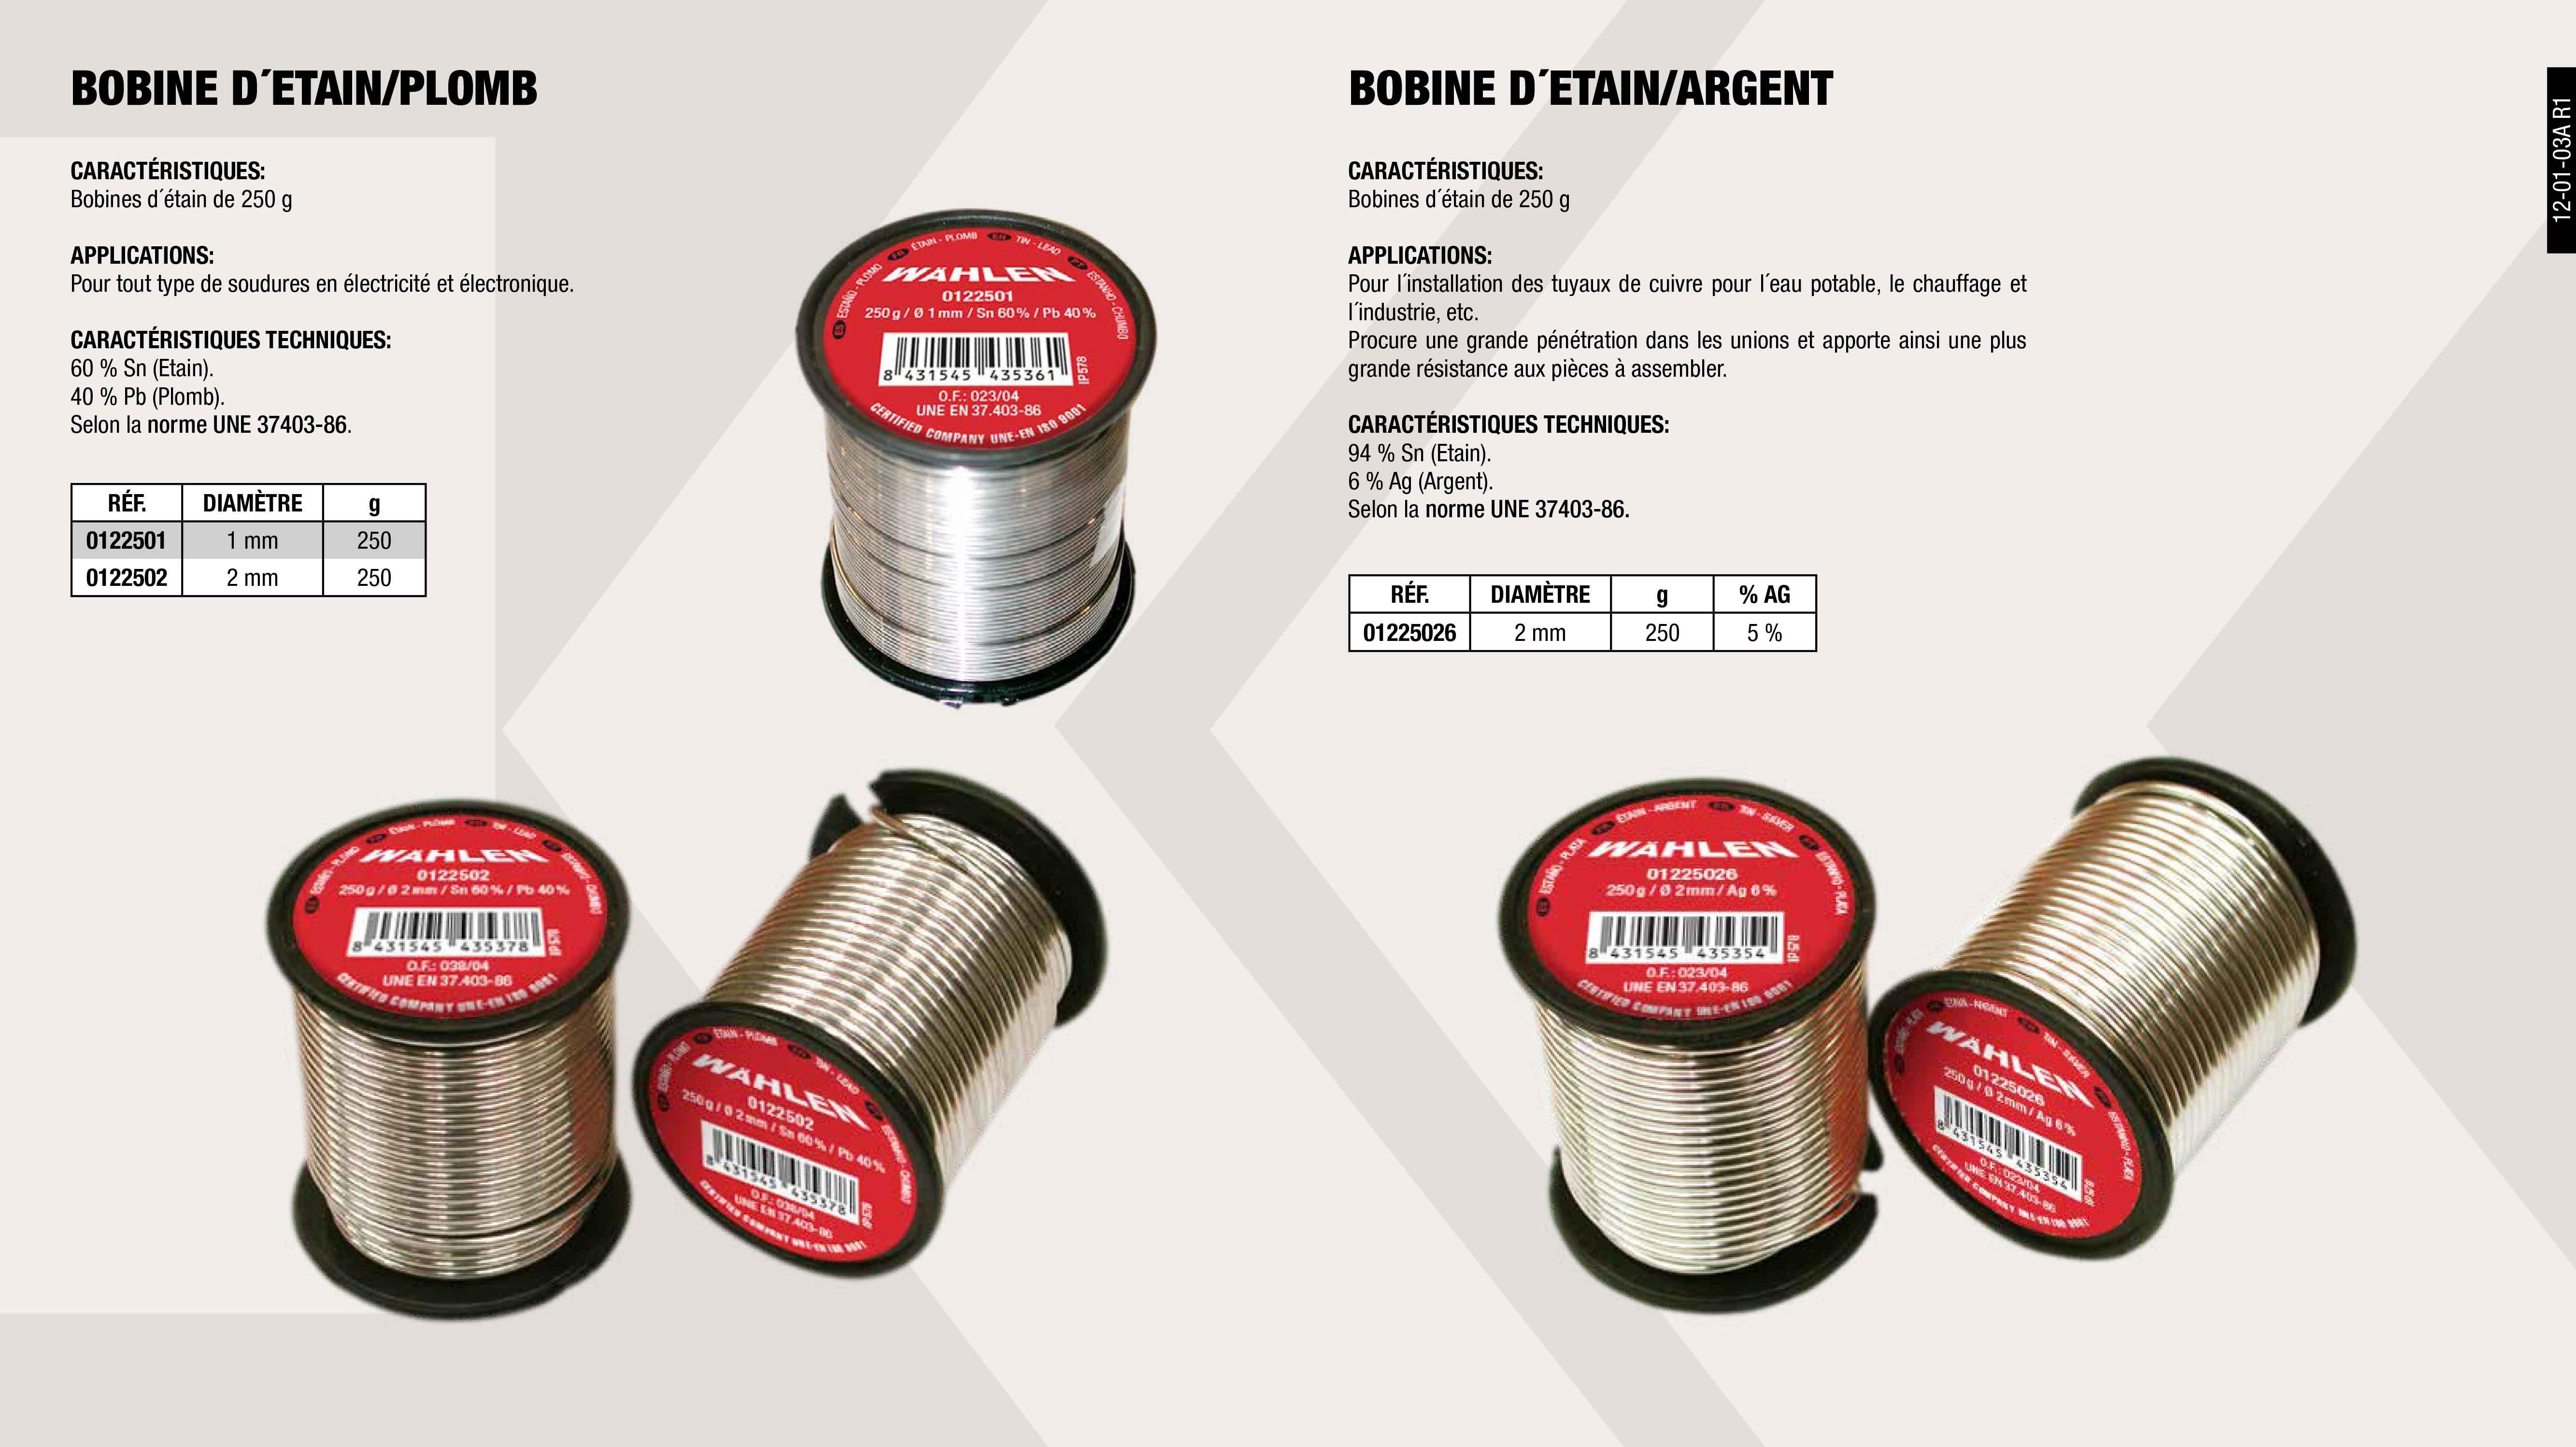 BOBINE ETAIN/ARGENT 250 GR 2 MM                             ,  BOBINE ETAIN/PLOMB 250 GR 2 MM                              ,  BOBINE ETAIN/PLOMB 250 GR 1 MM                              ,